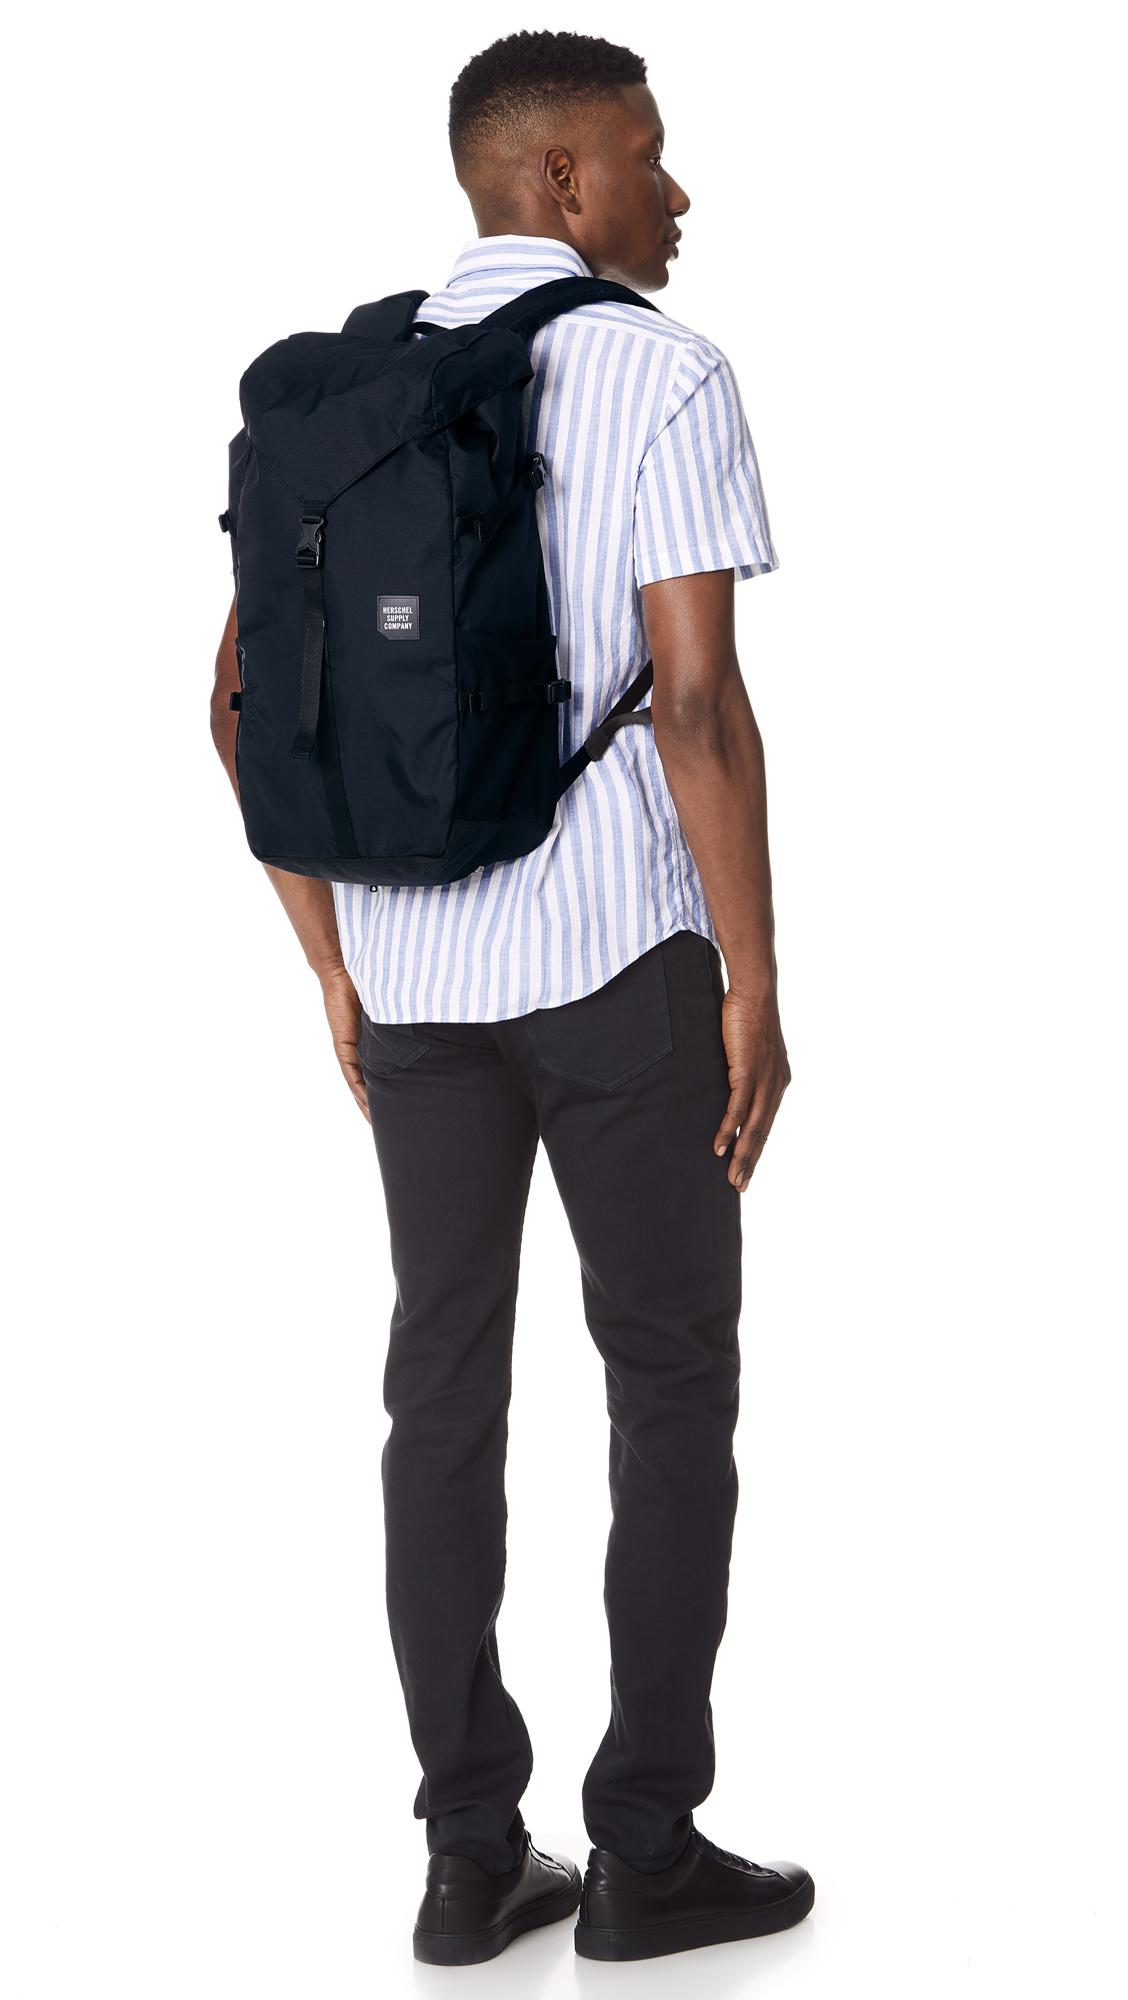 b9cdc5e1a7e Herschel Supply Co. Trail Barlow Large Backpack